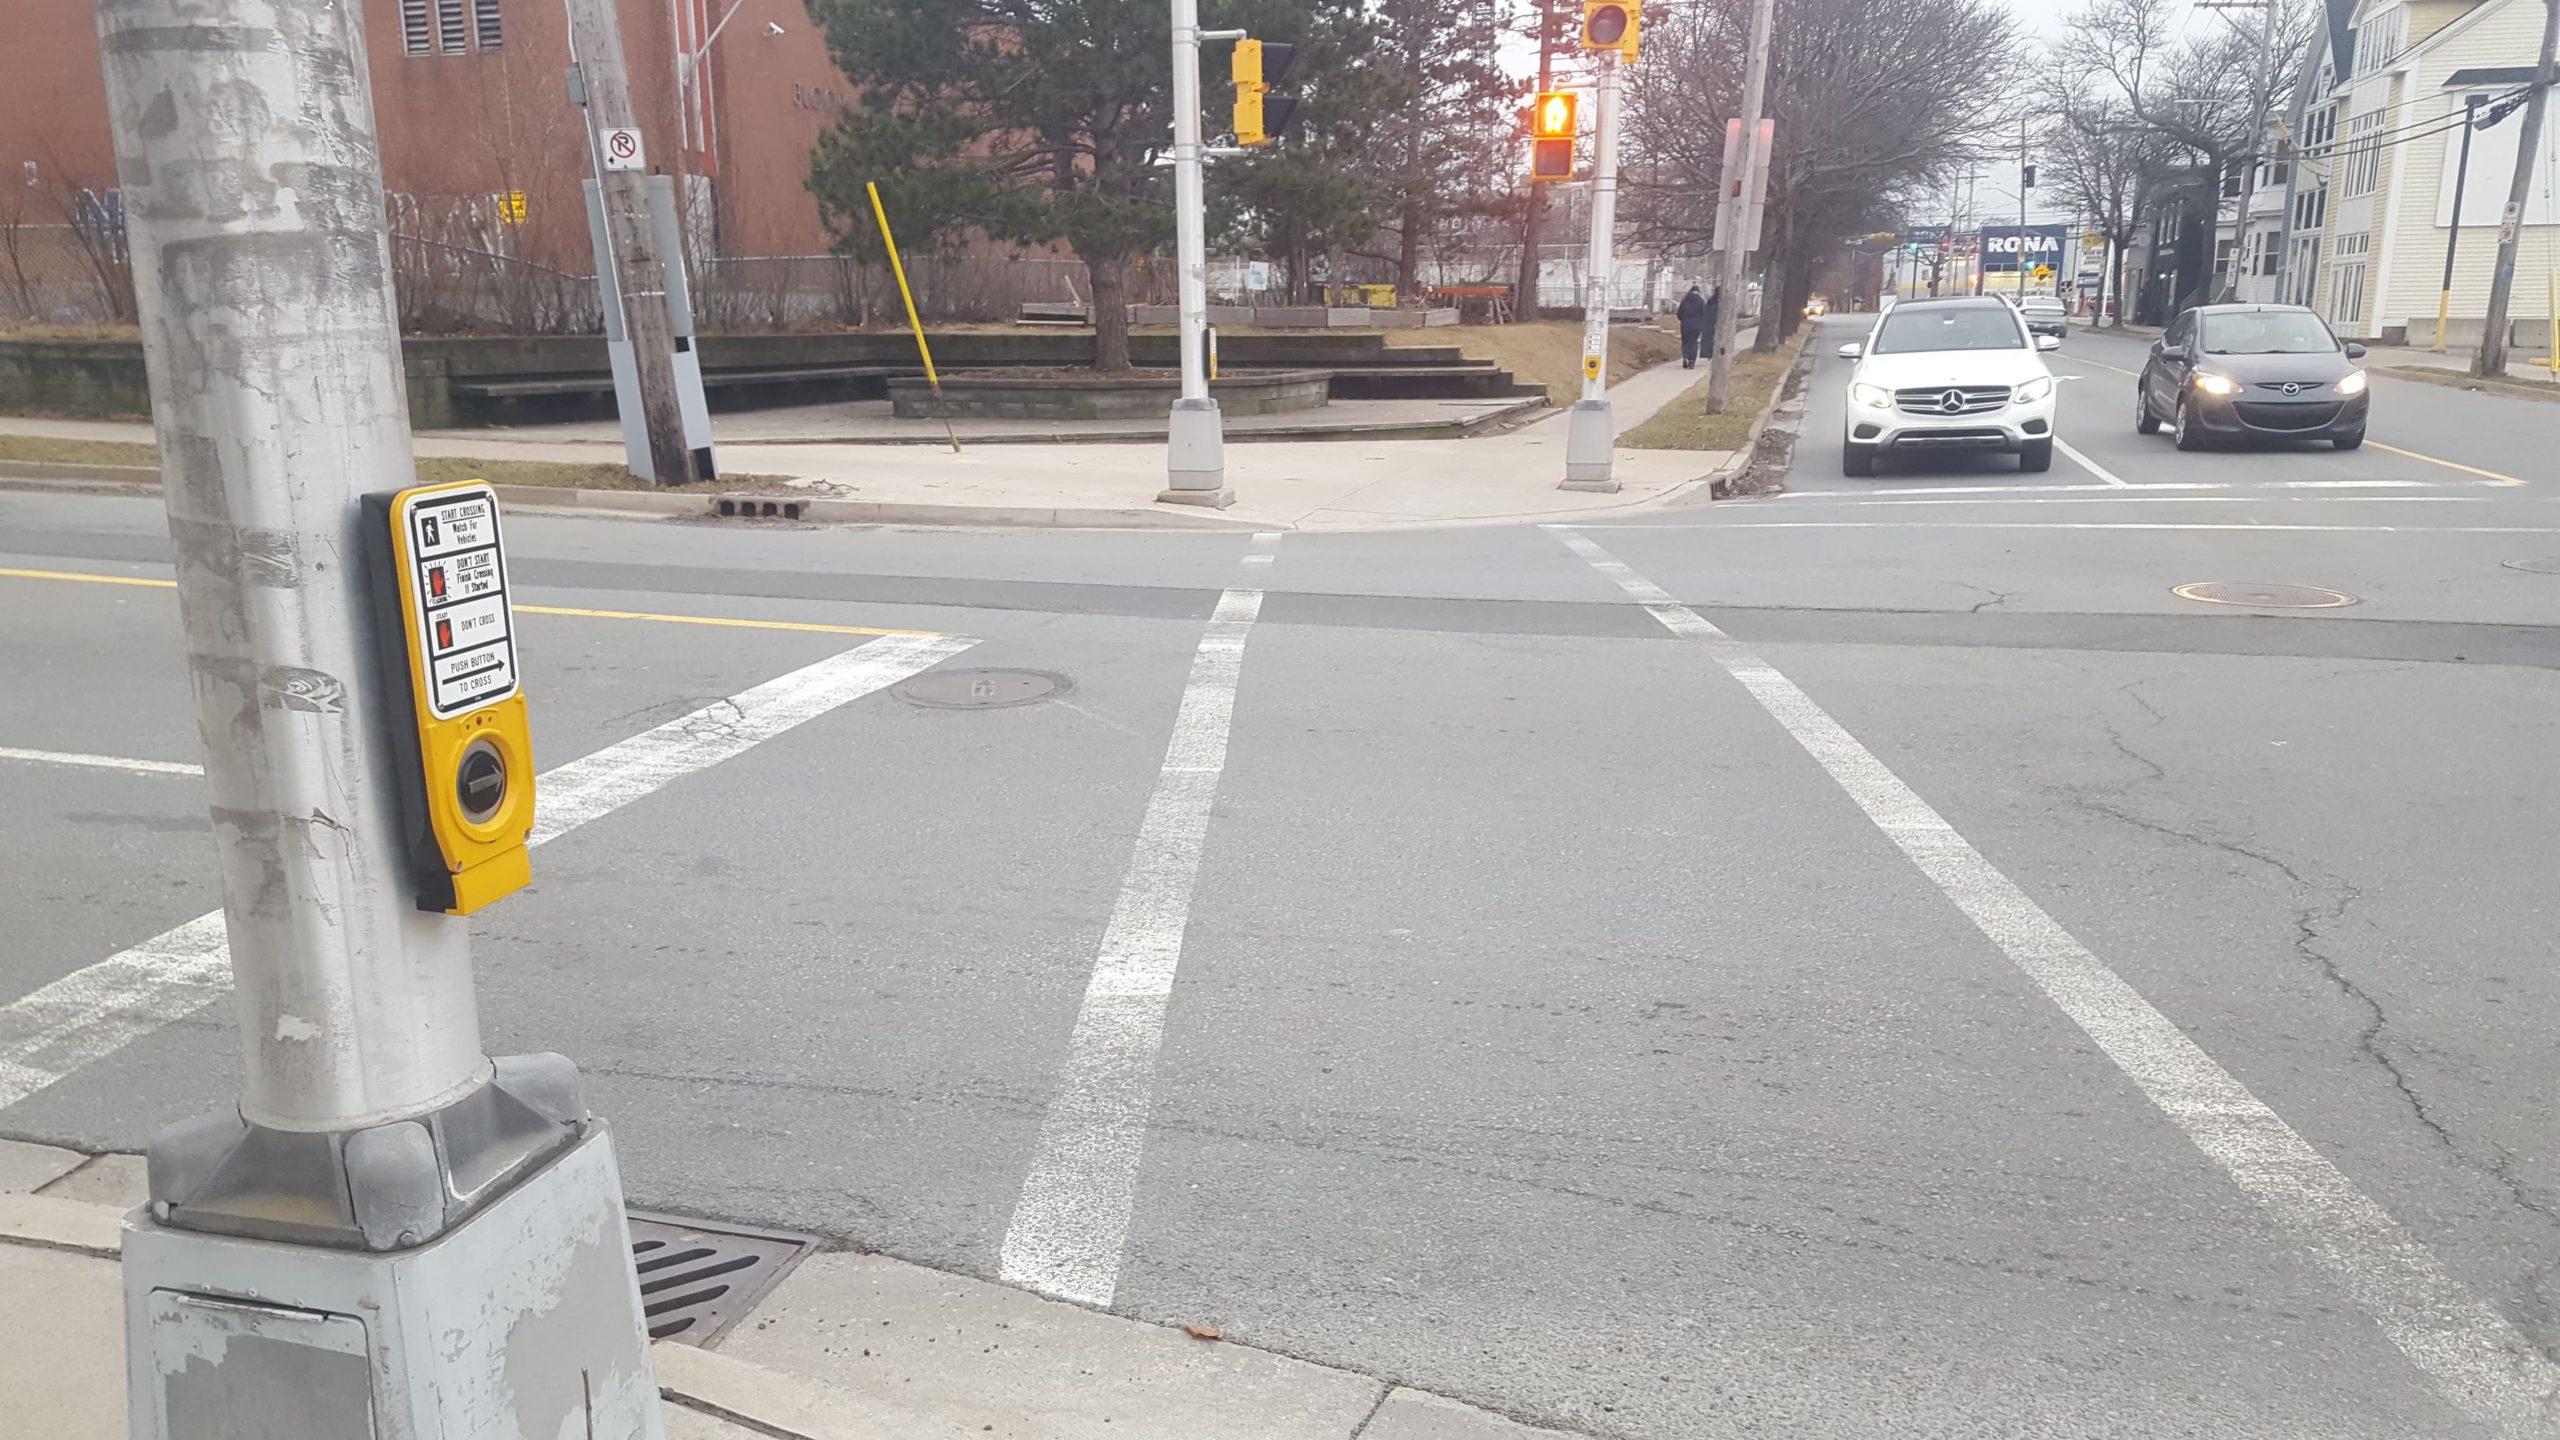 An Accessible Pedestrian Signal in Halifax.